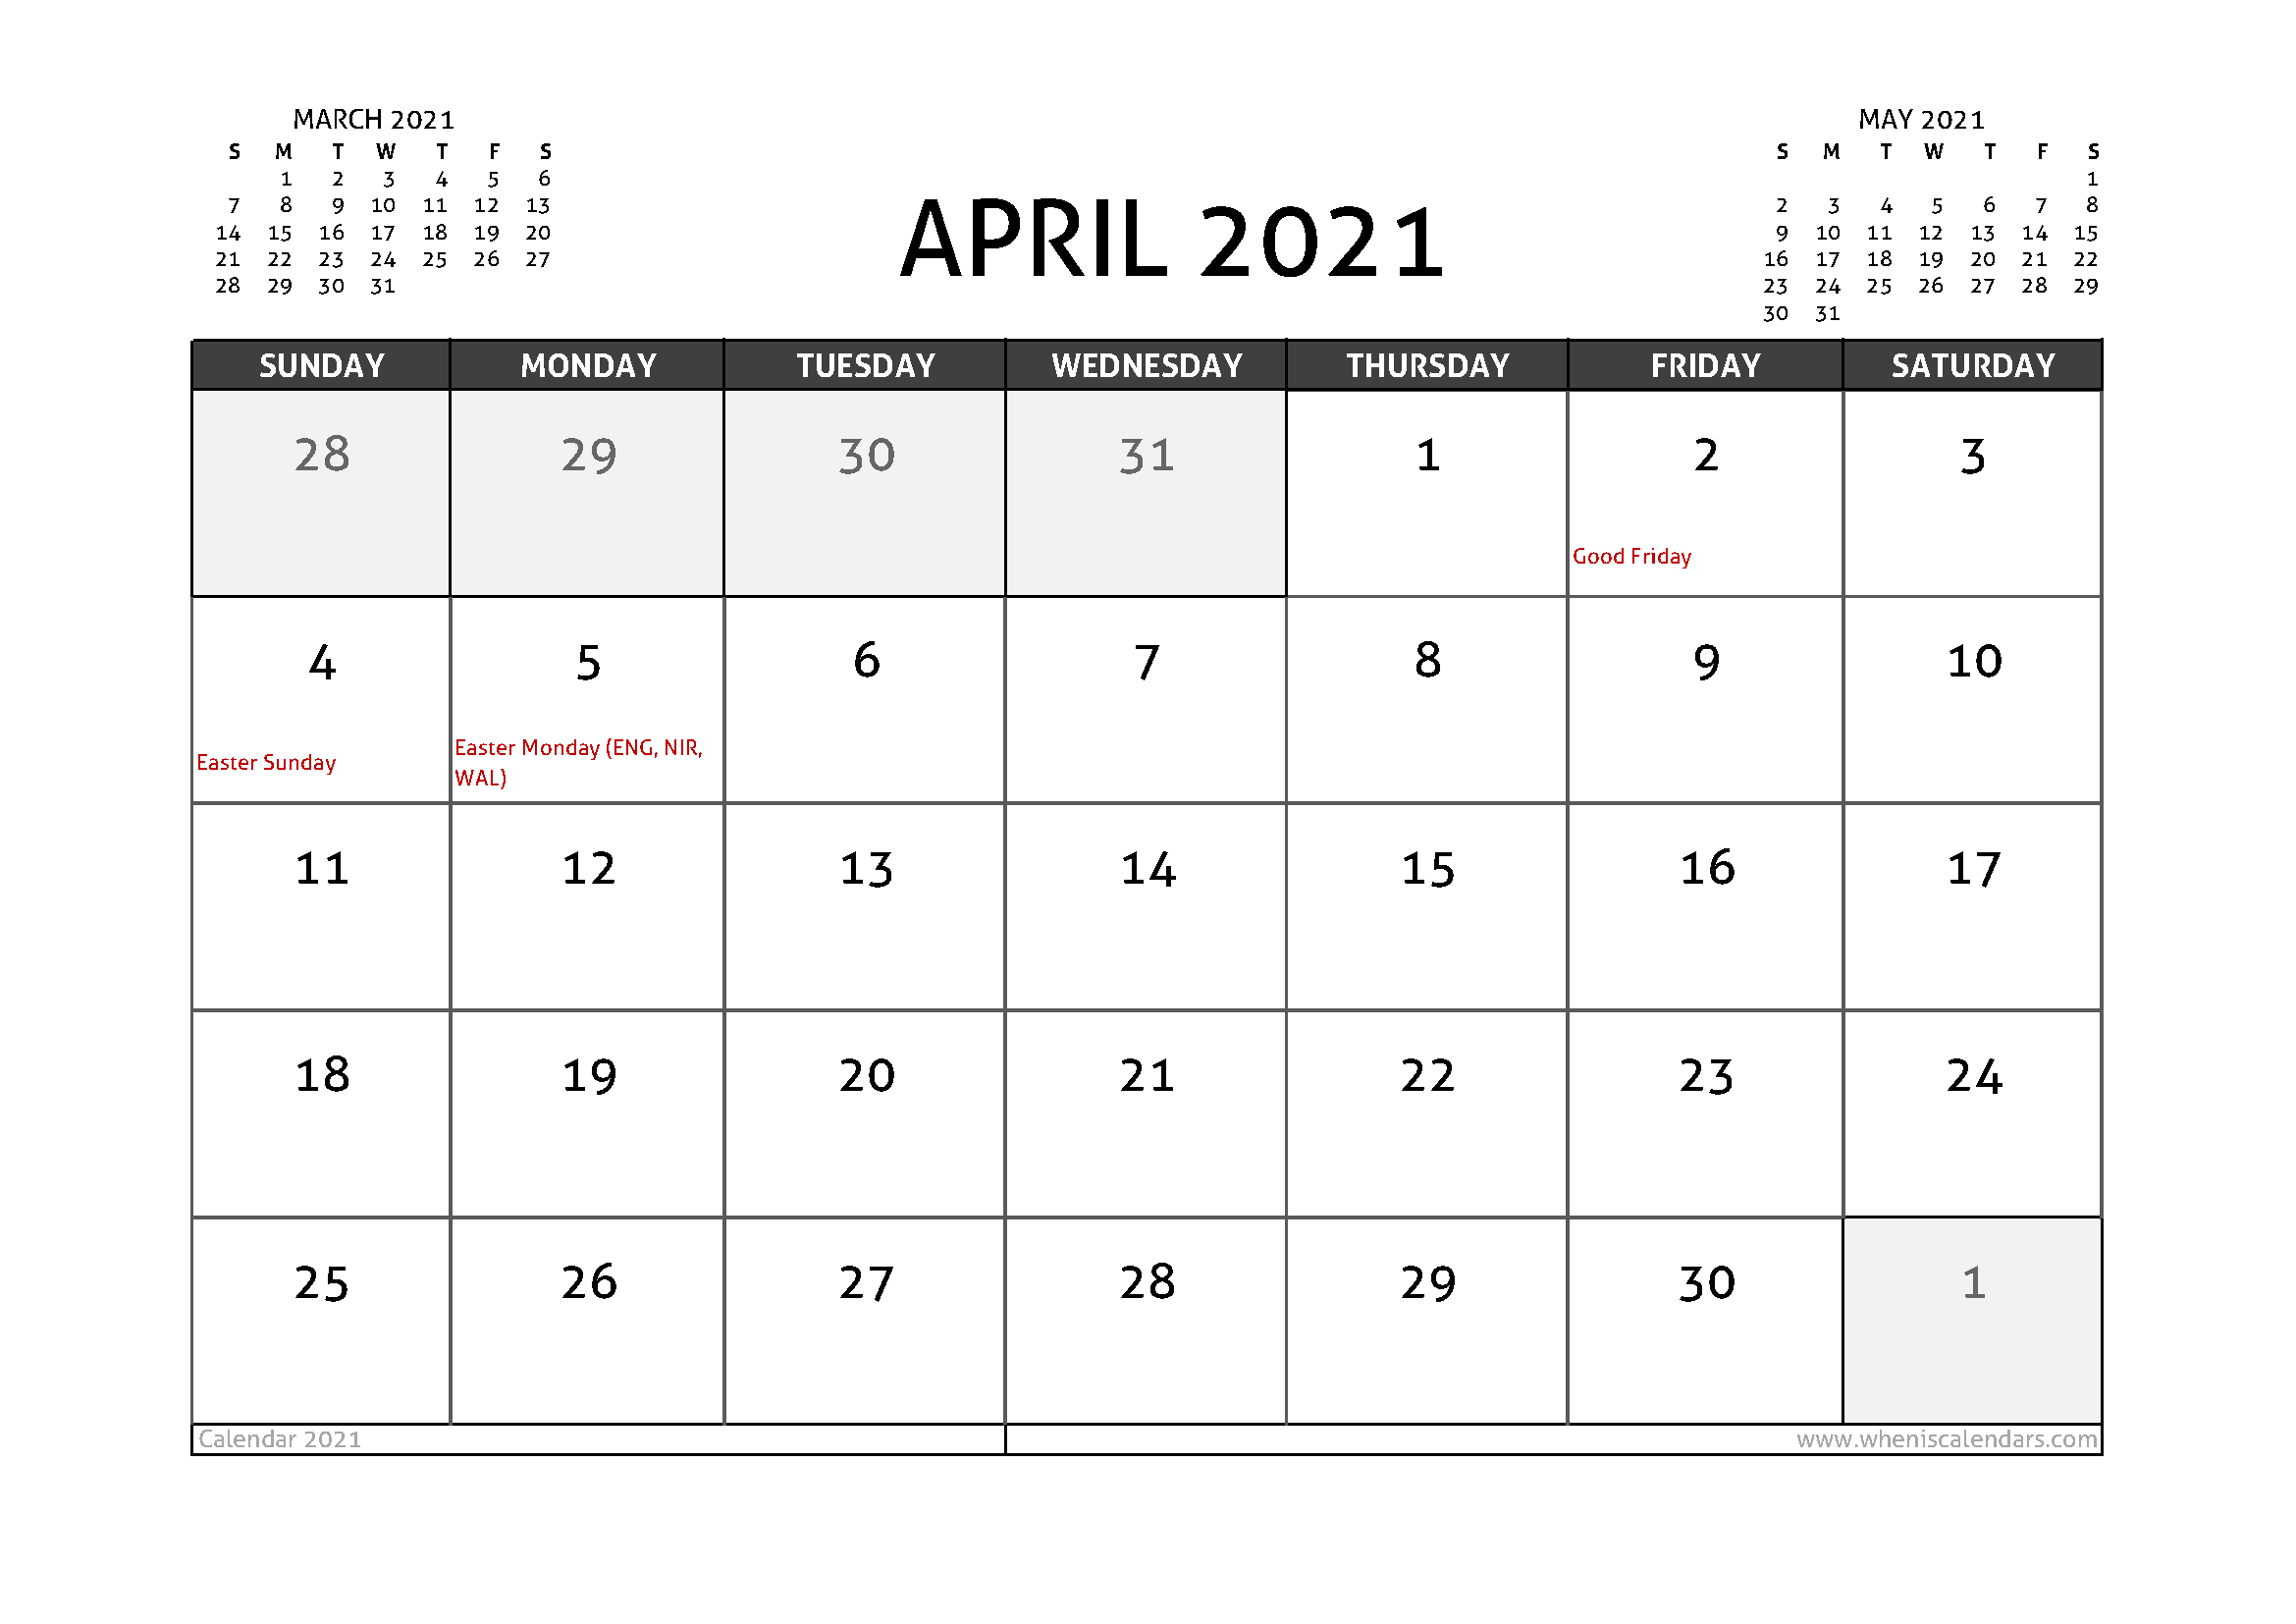 April 2021 Calendar UK with Holidays - Free Printable 2020 ...